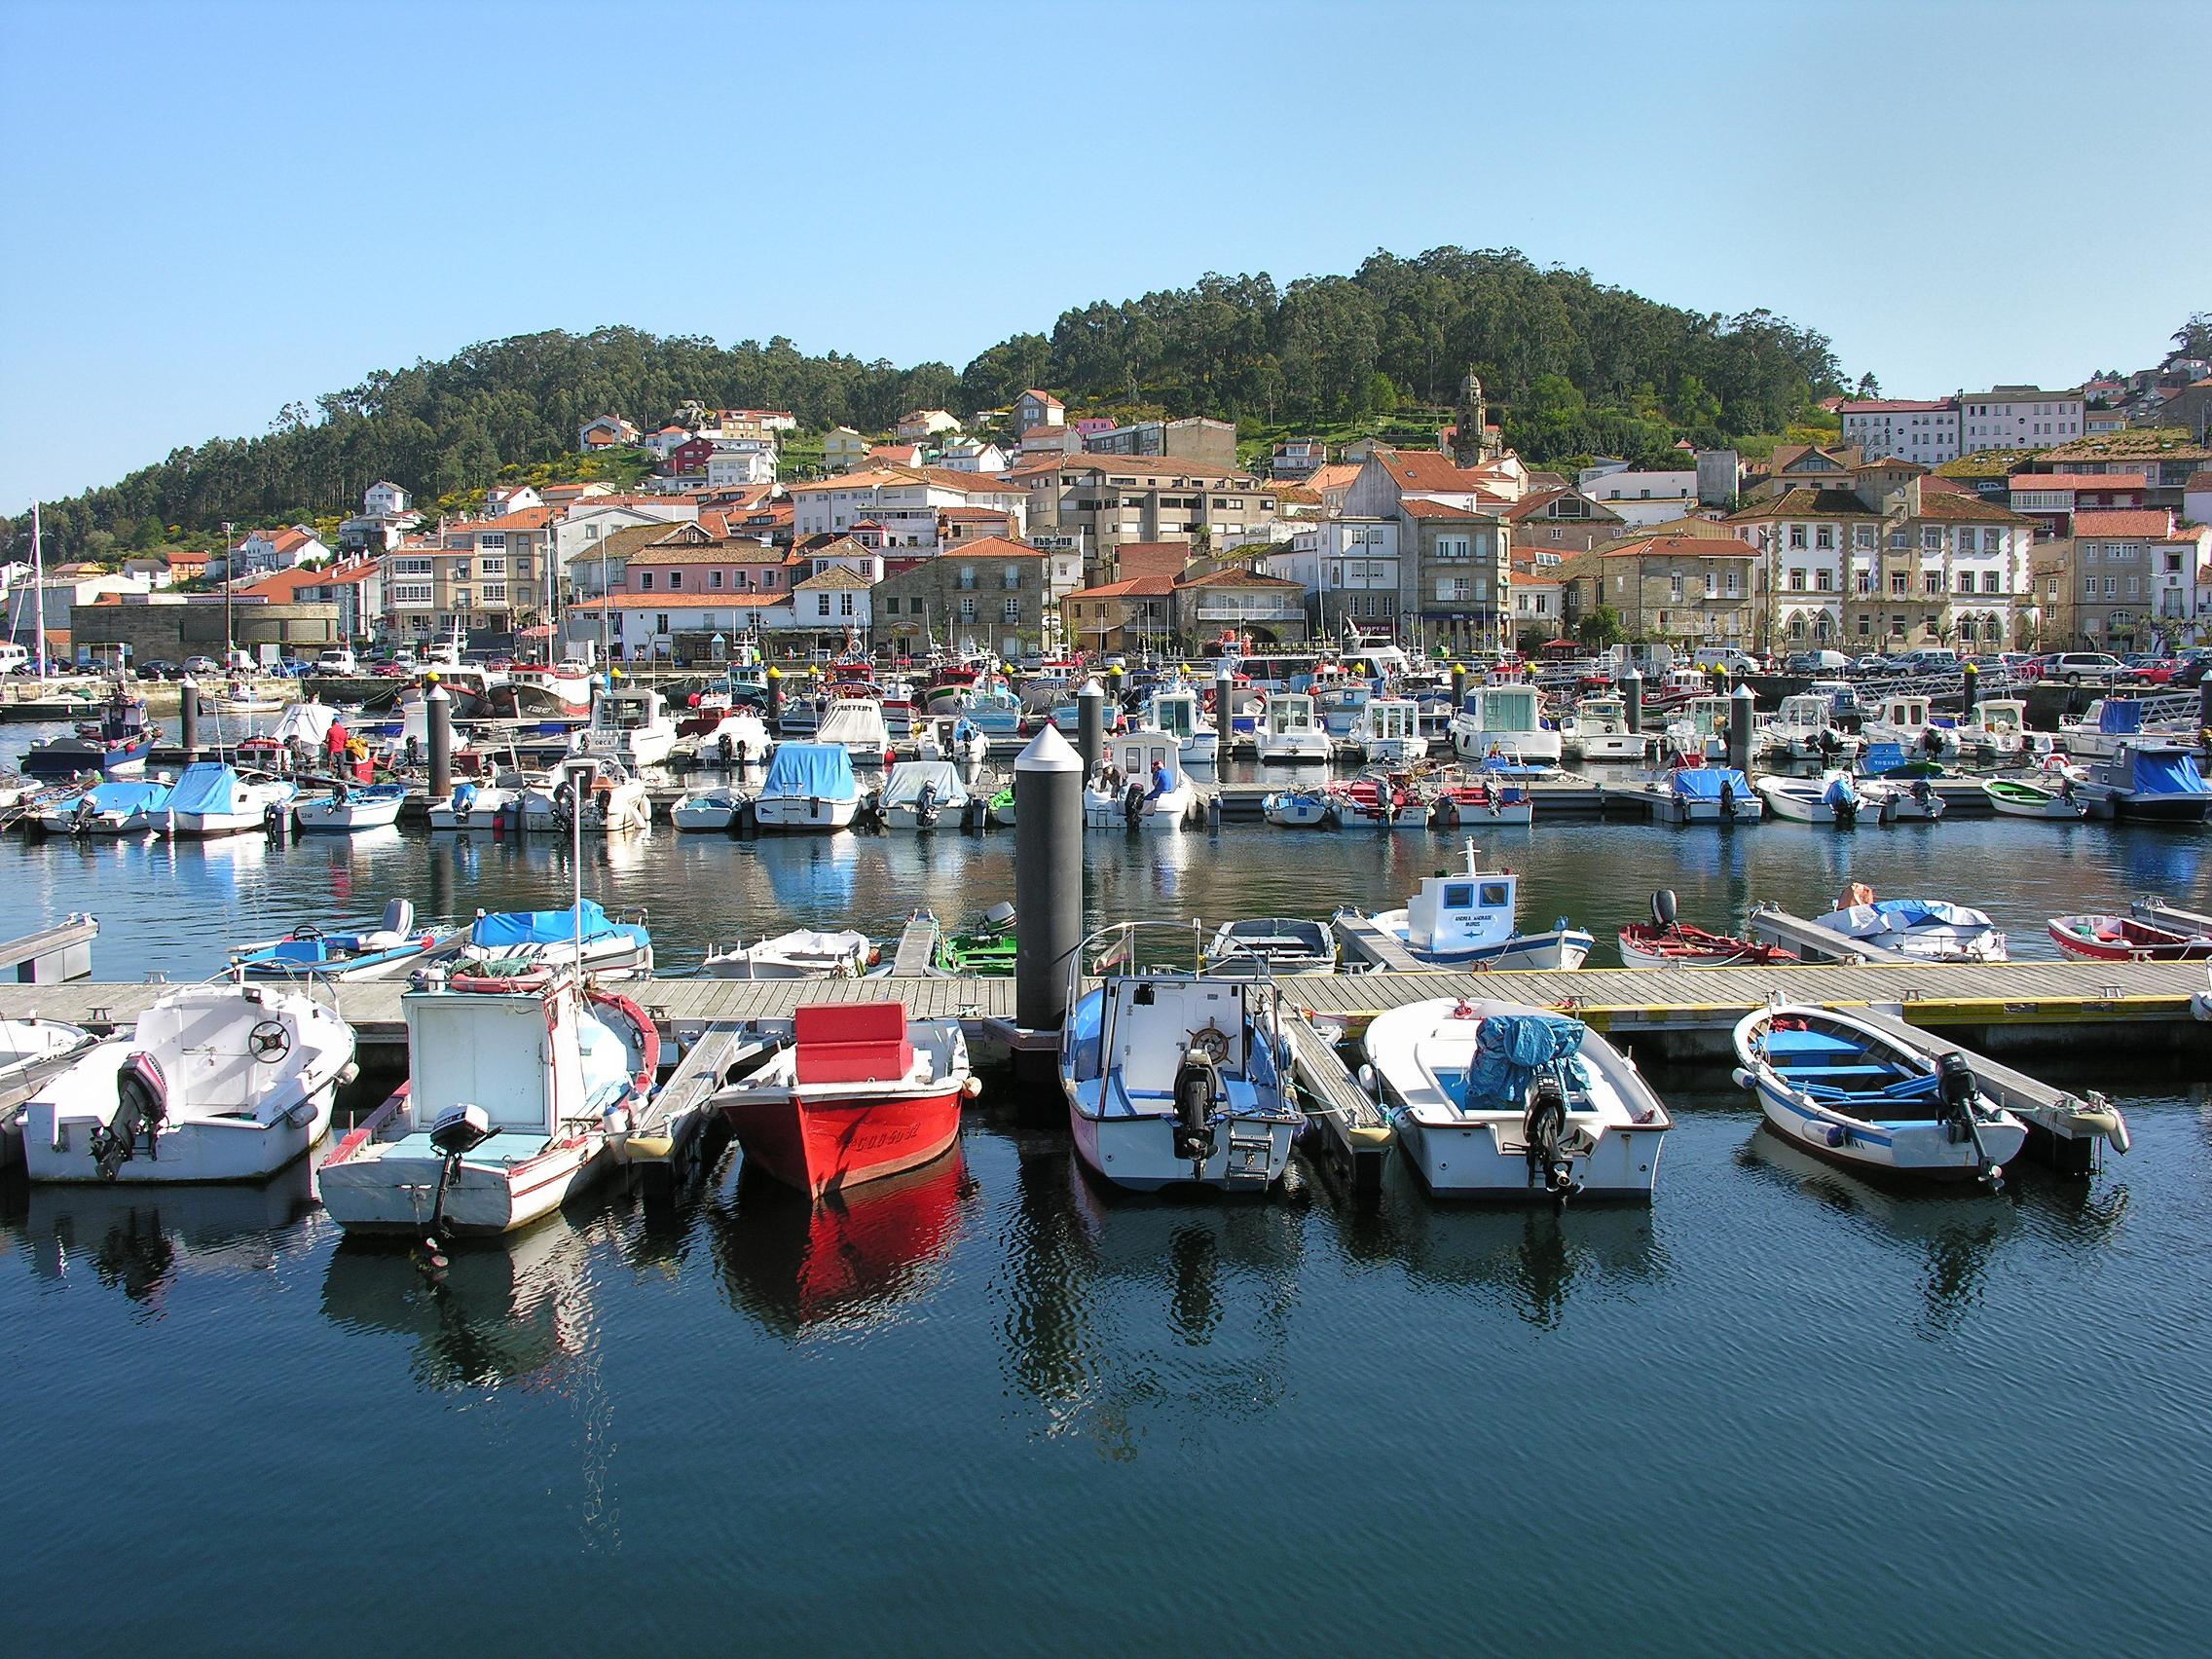 File:Muros.Galiza.04-2008.jpg - Wikimedia Commons